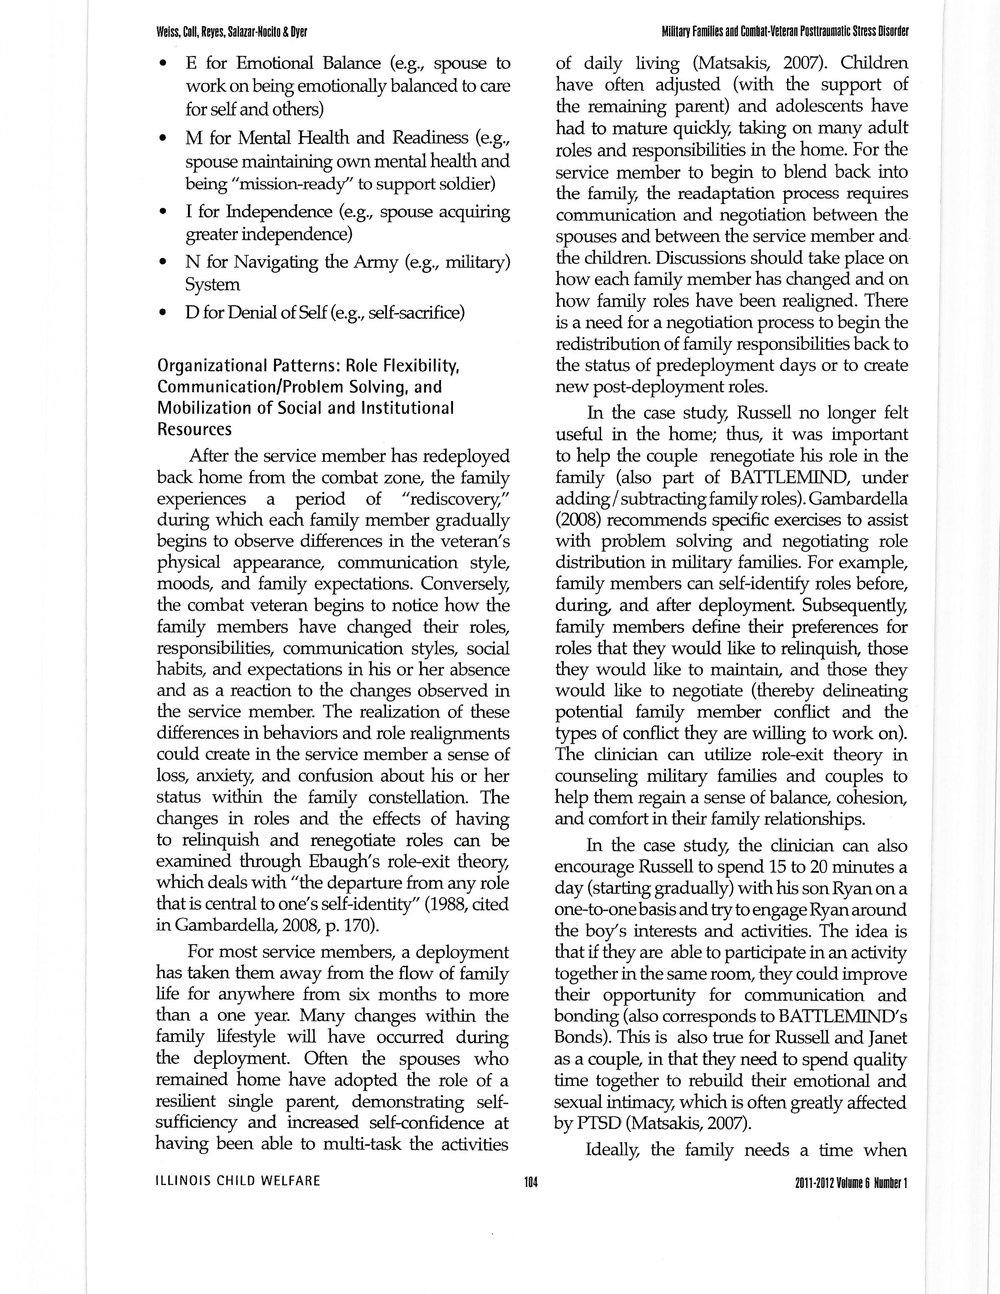 MilitaryFamiliesandCombat-Vet_Page_12-2.jpg